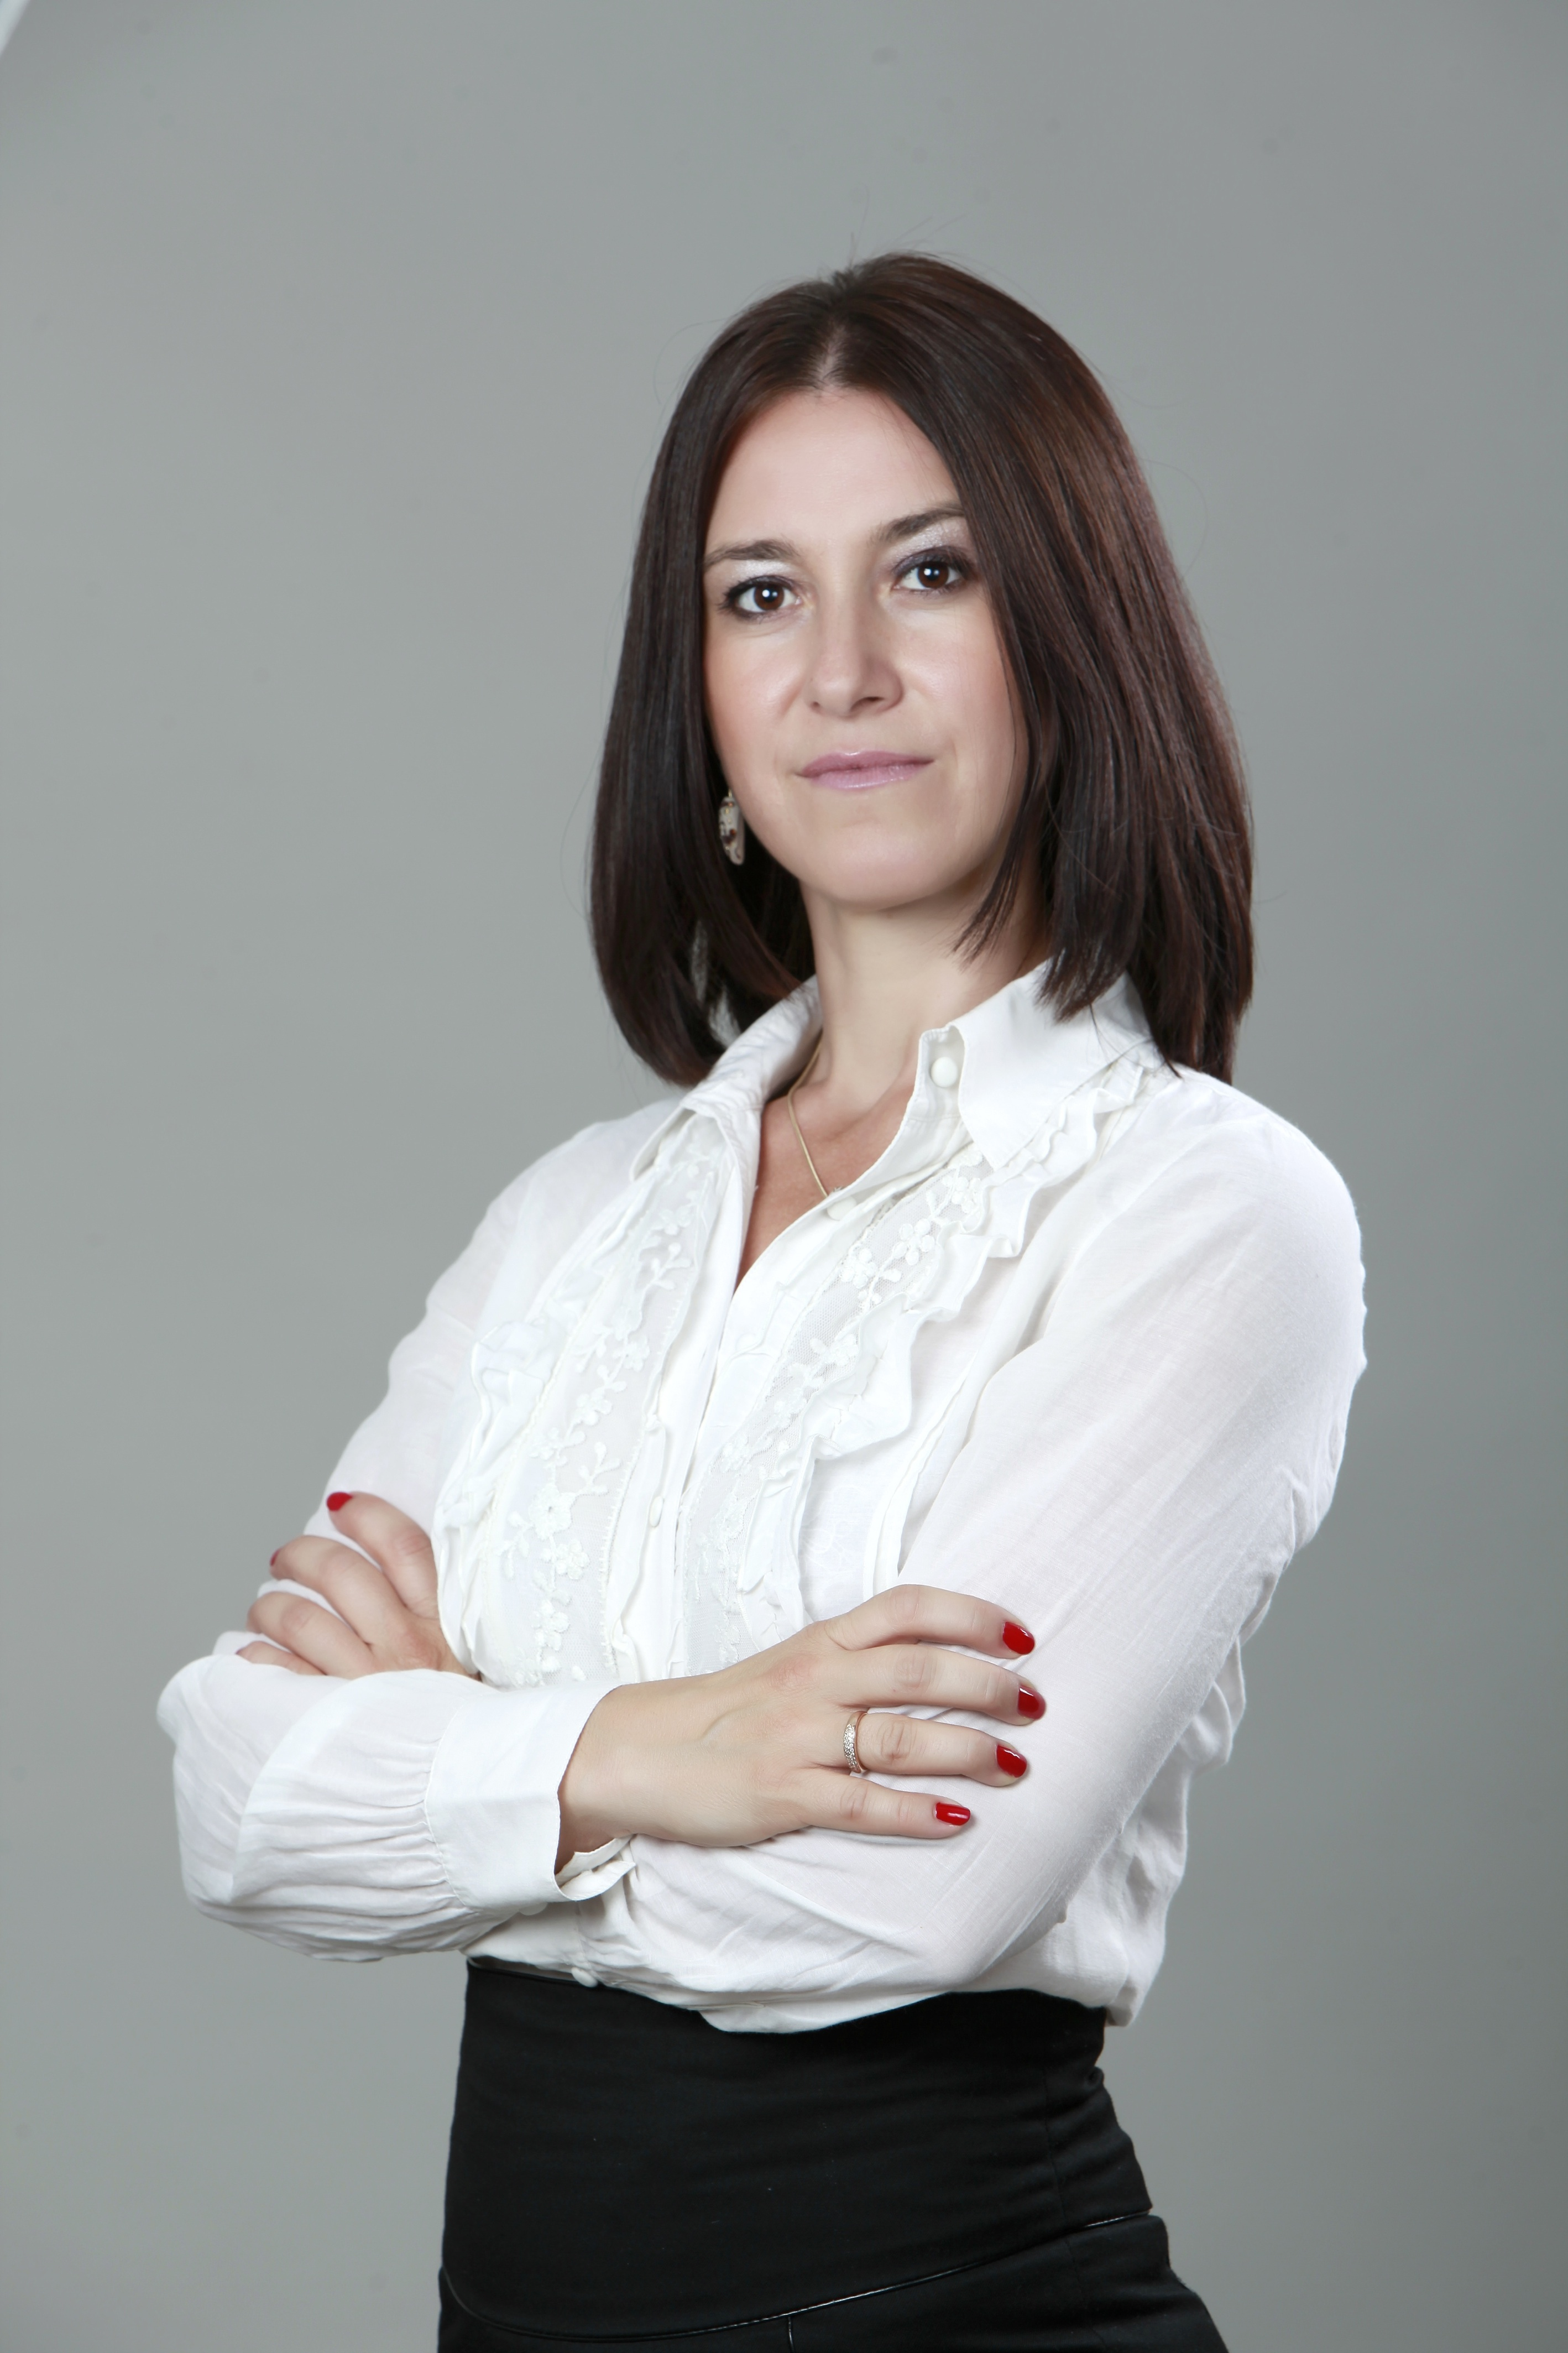 stanislava-ligka-foto-mala